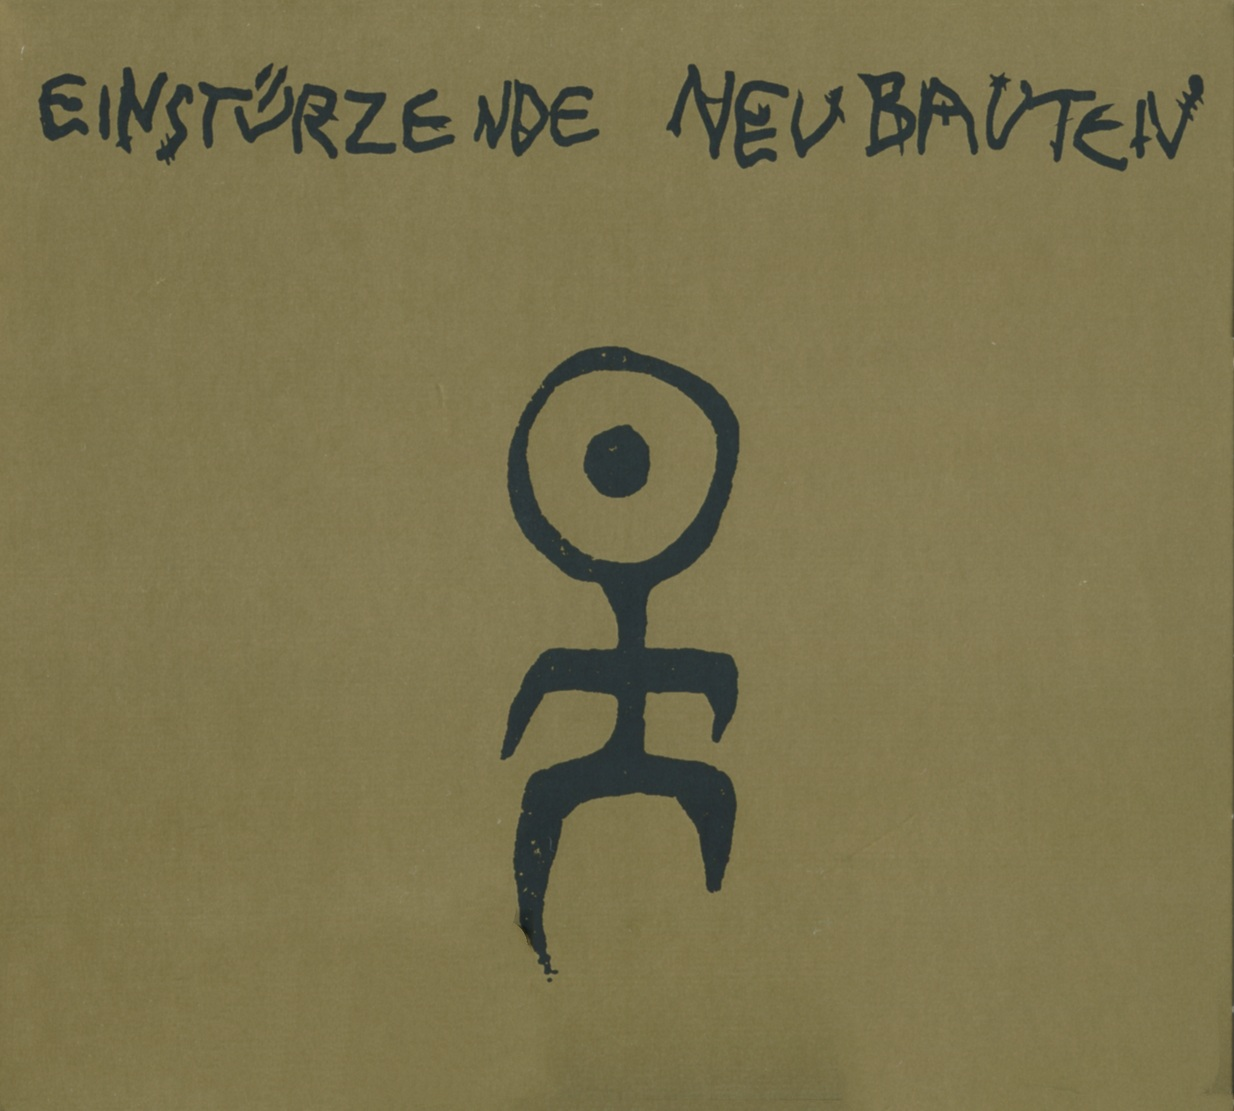 Einstürzende Neubauten - Kollaps (1981) {Potomak 25172 rel 2003}